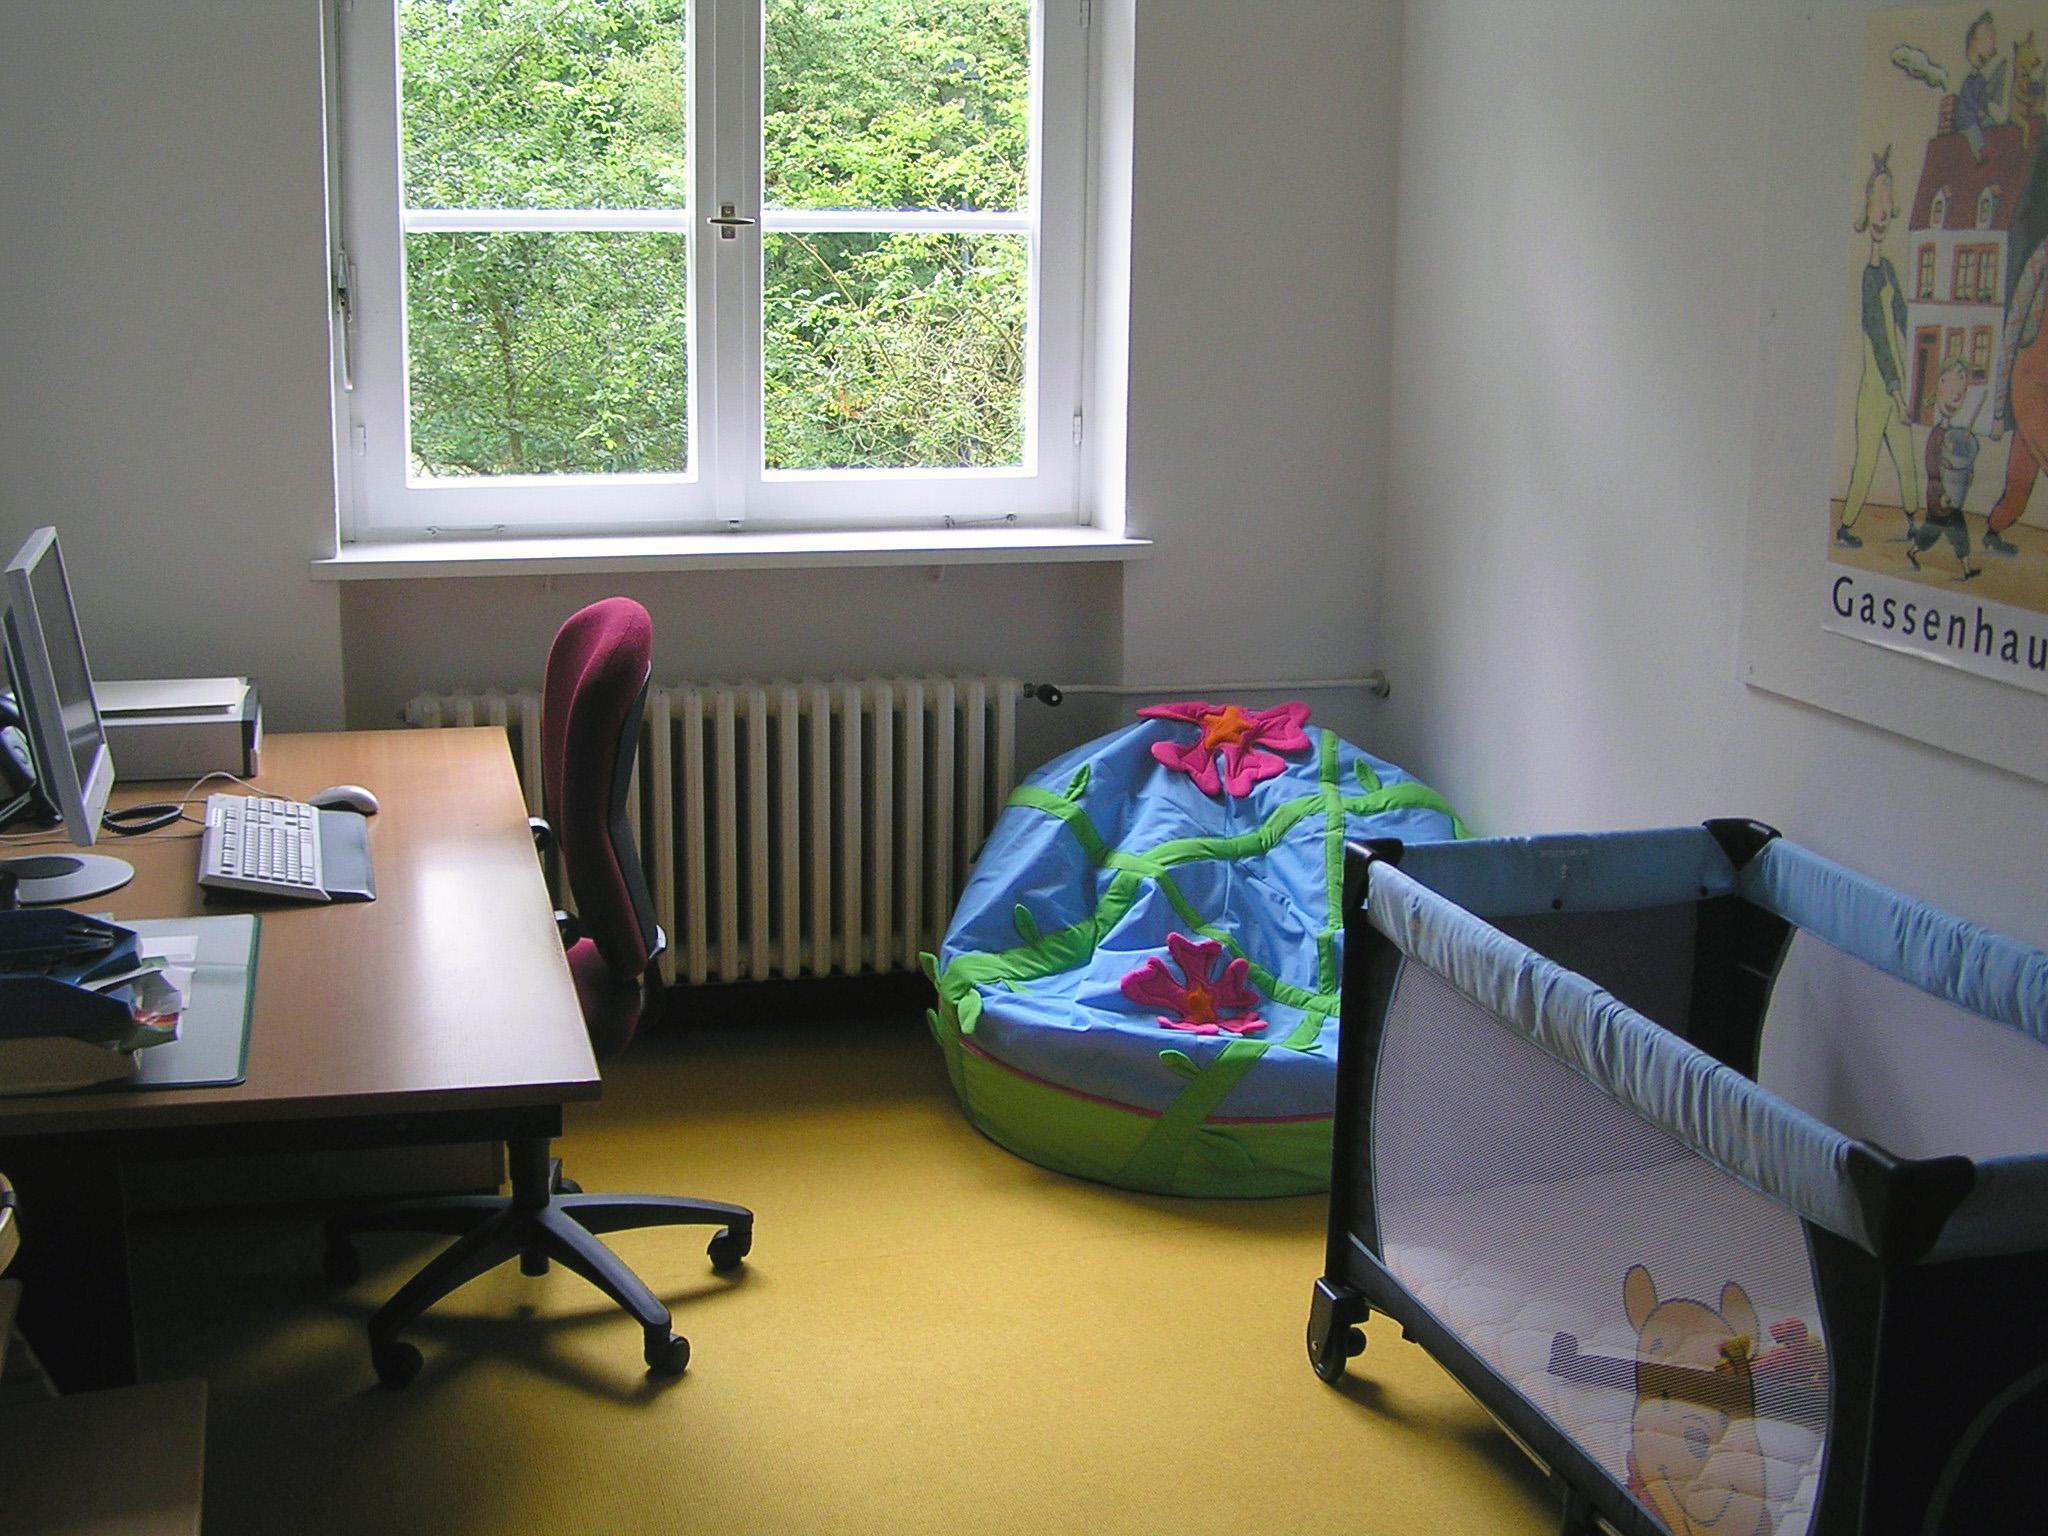 eltern kind arbeitszimmer und kita belegpl tze. Black Bedroom Furniture Sets. Home Design Ideas